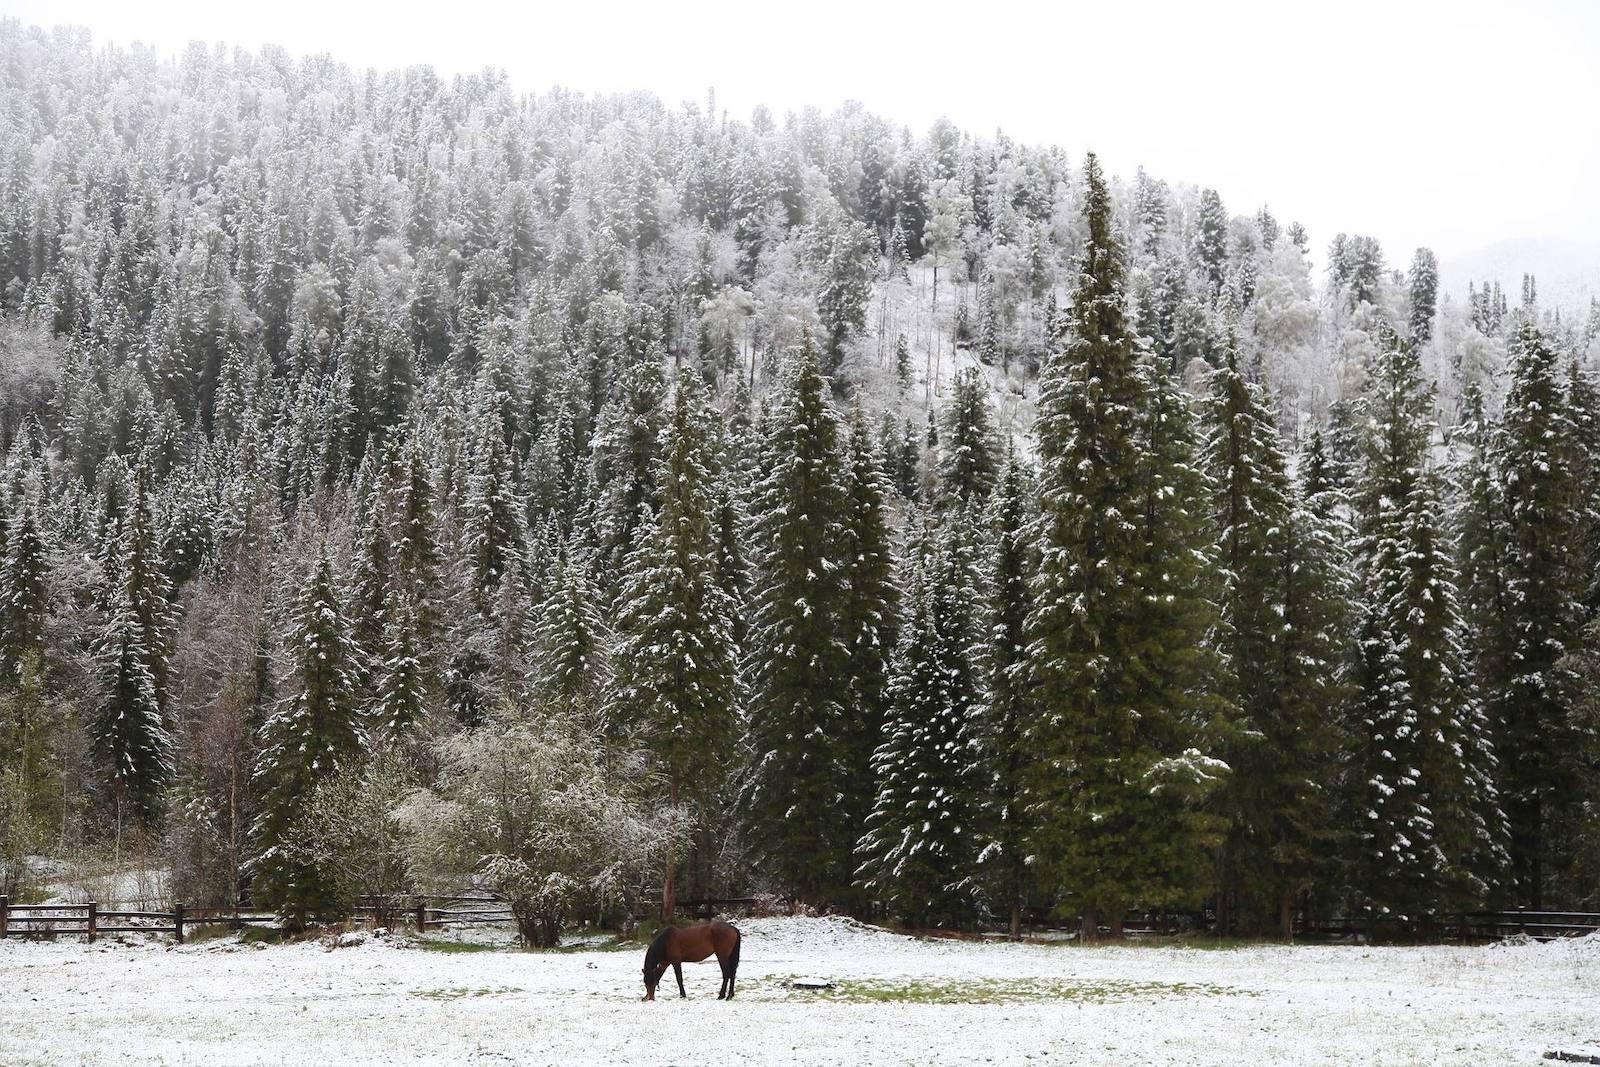 Horse grazing near Yellowstone in winter